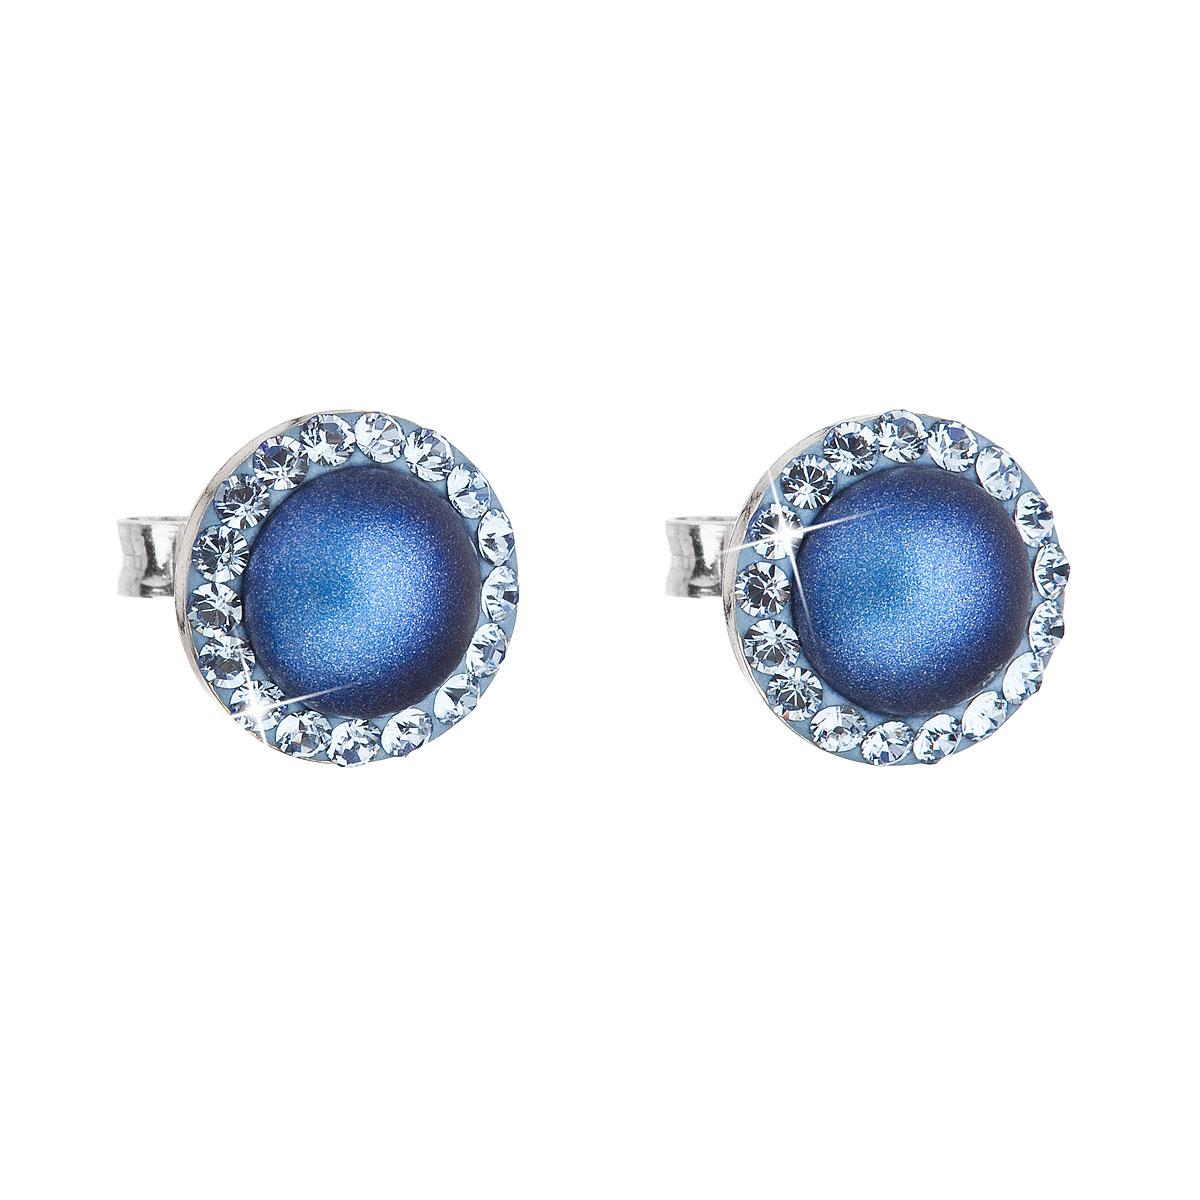 Evolution Group Stříbrné náušnice pecka s krystaly Swarovski a tmavěmodrou matnou perlou kulaté 31214.3